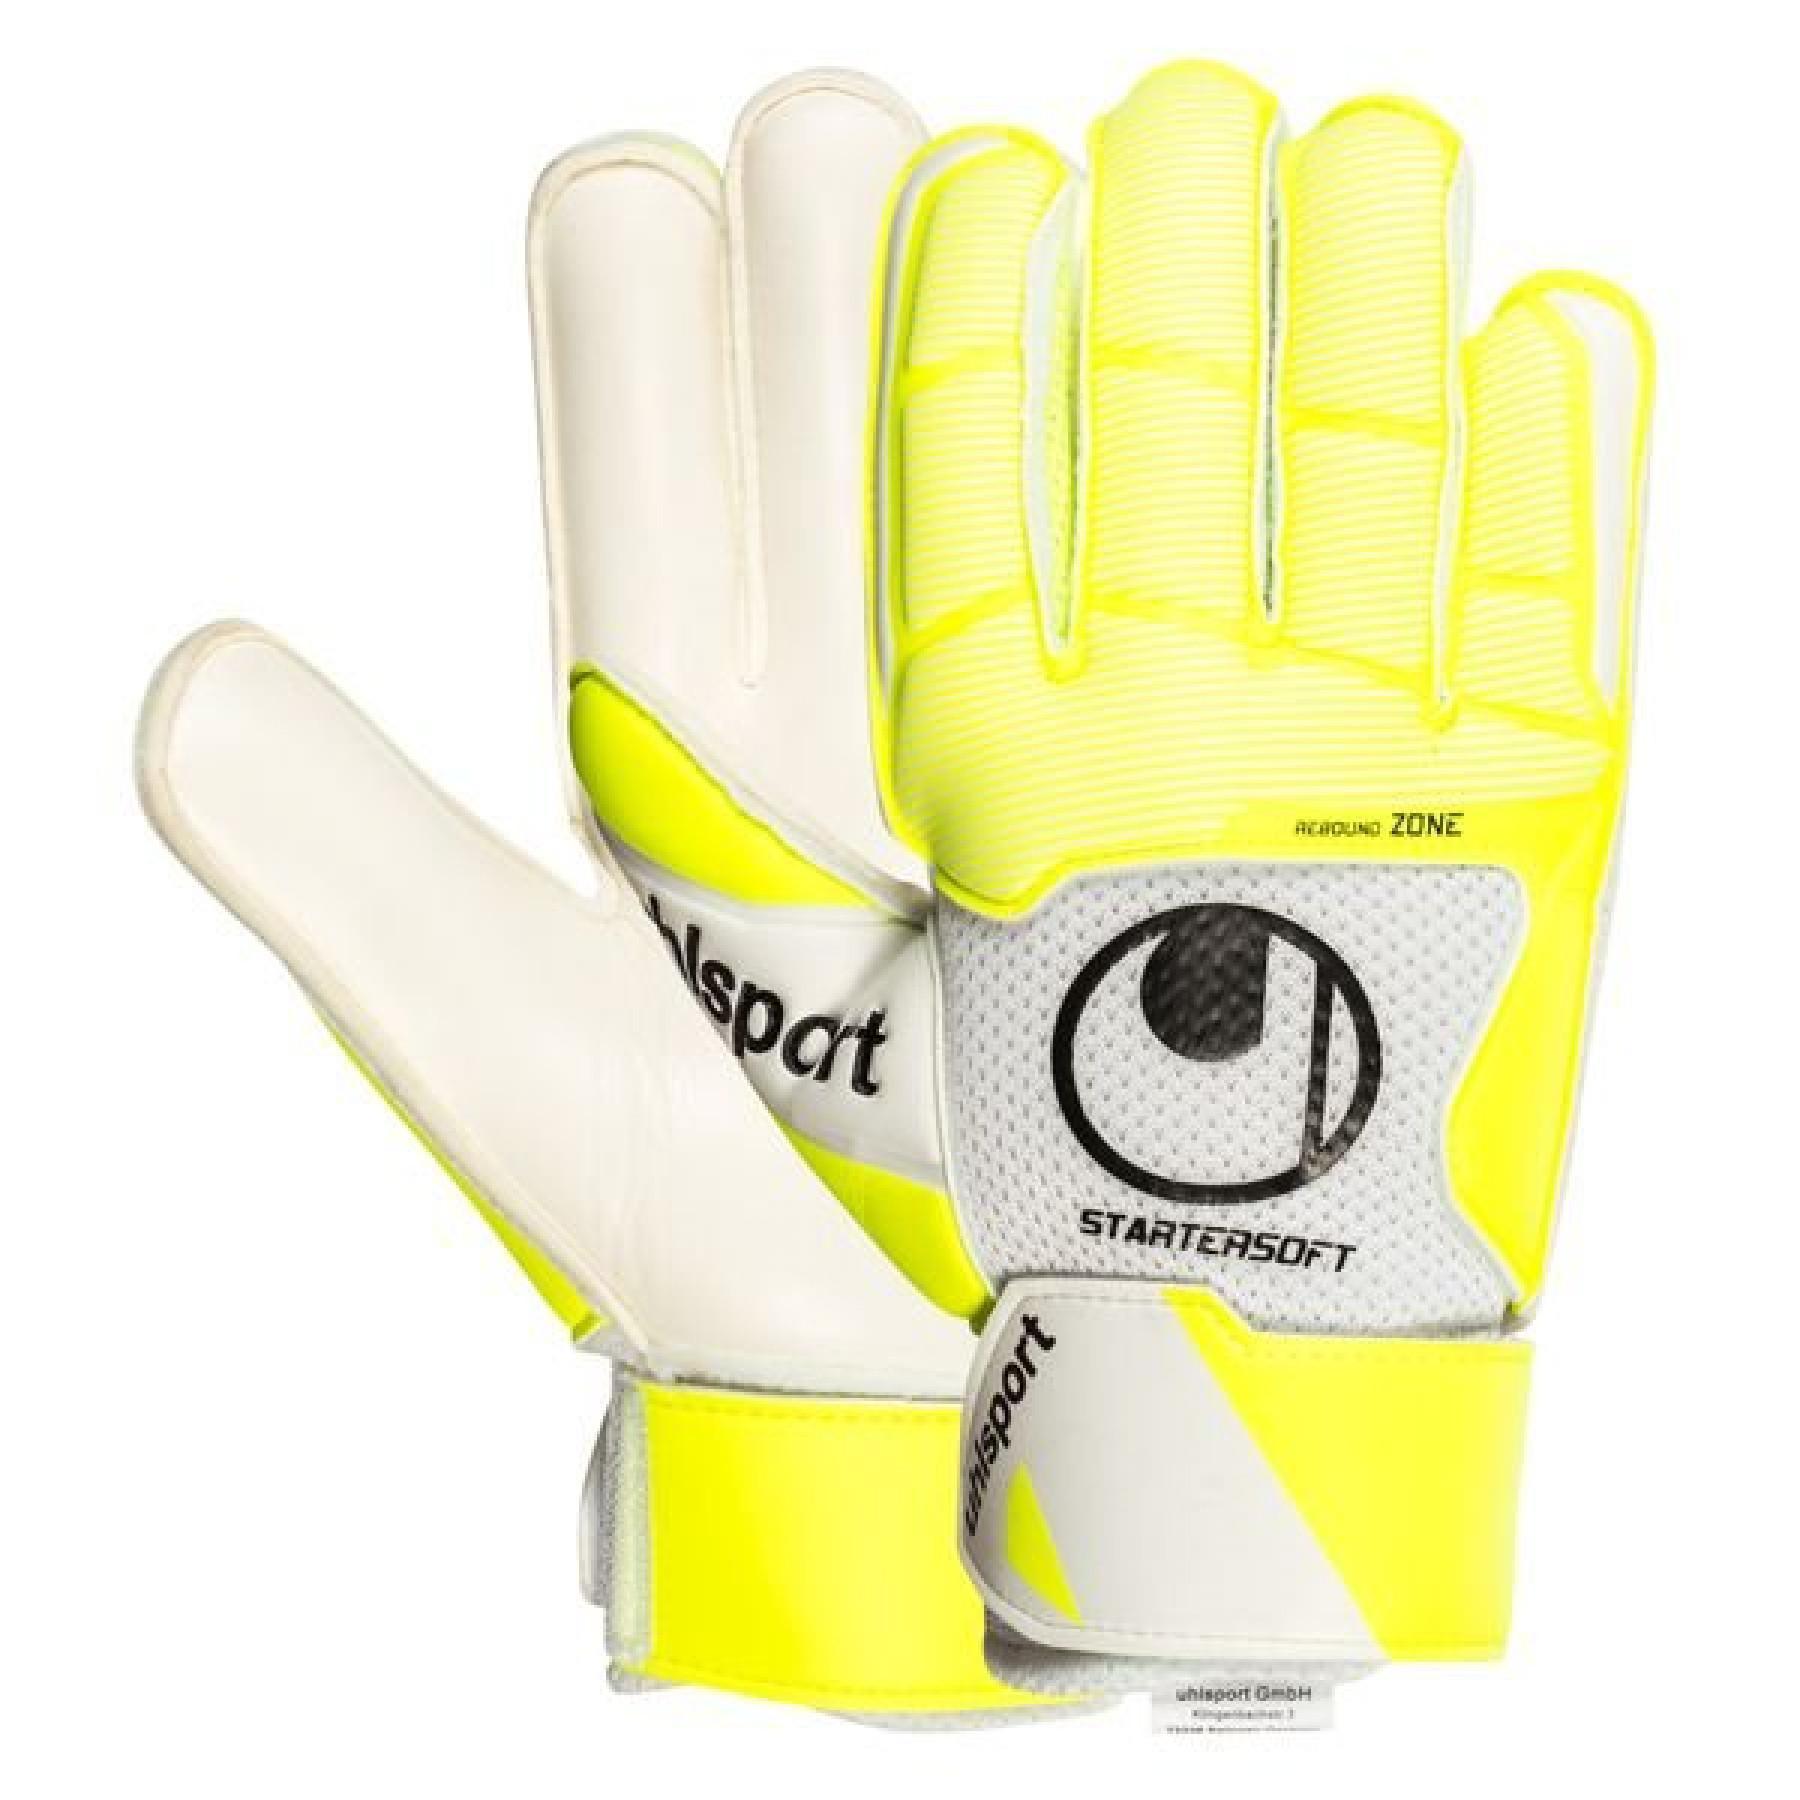 Goalkeeper gloves Uhlsport Pure Alliance Starter Soft